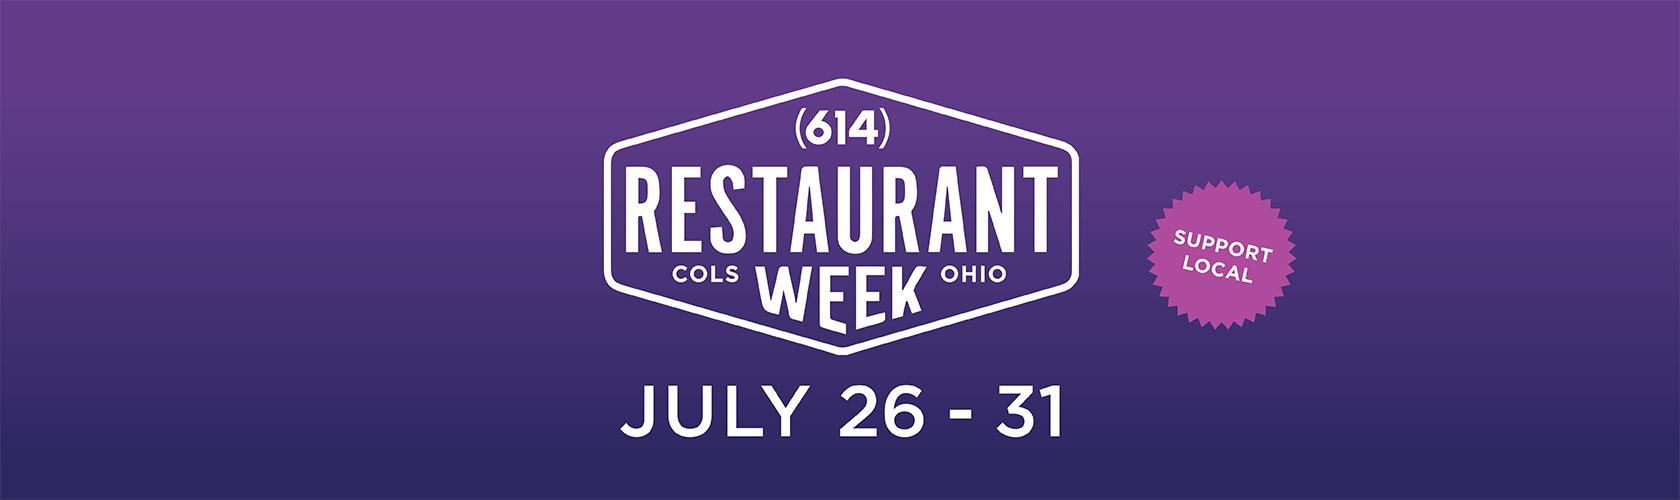 614 Restaurant Week July 26 to 31